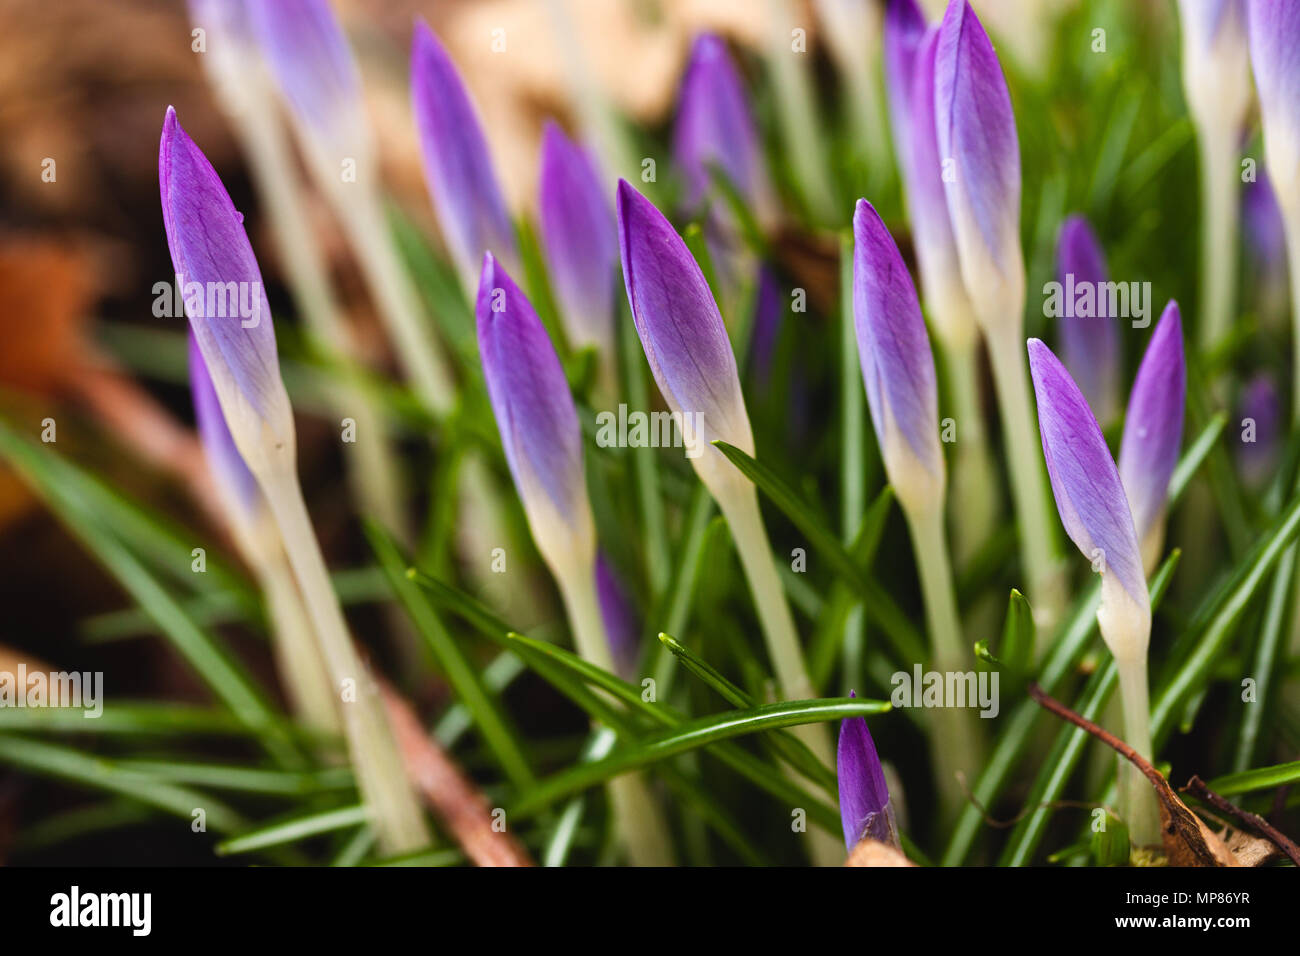 Purple Flowers Against A Green Grass In The Gardenfresh Stock Photo